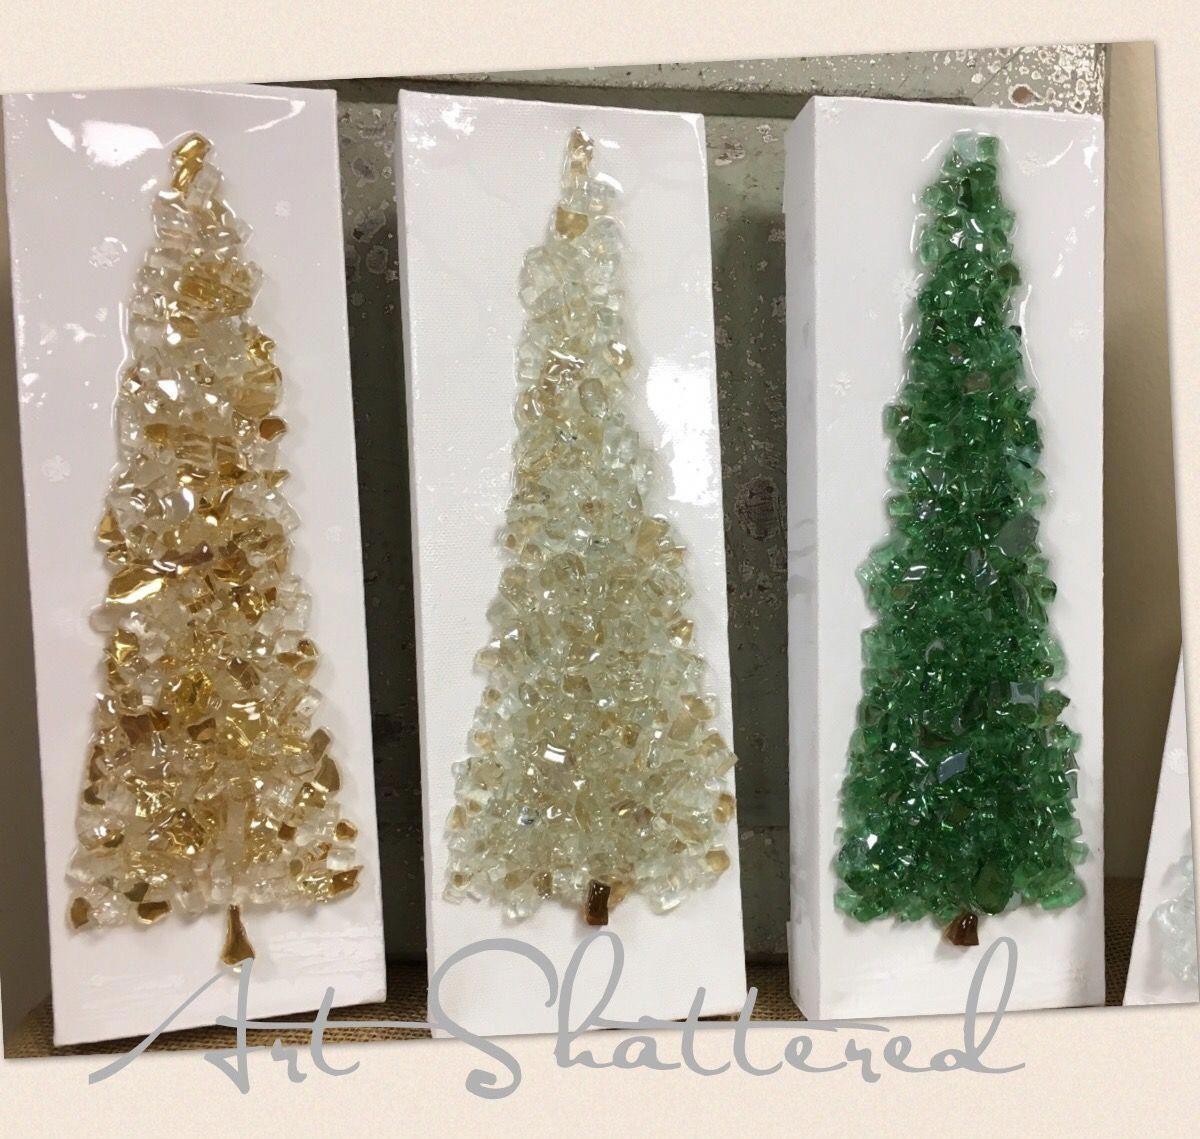 Cute Little 4x12 Glass Christmas Trees By Art Shattered Broken Glass Crafts Broken Glass Art Glass Art Techniques